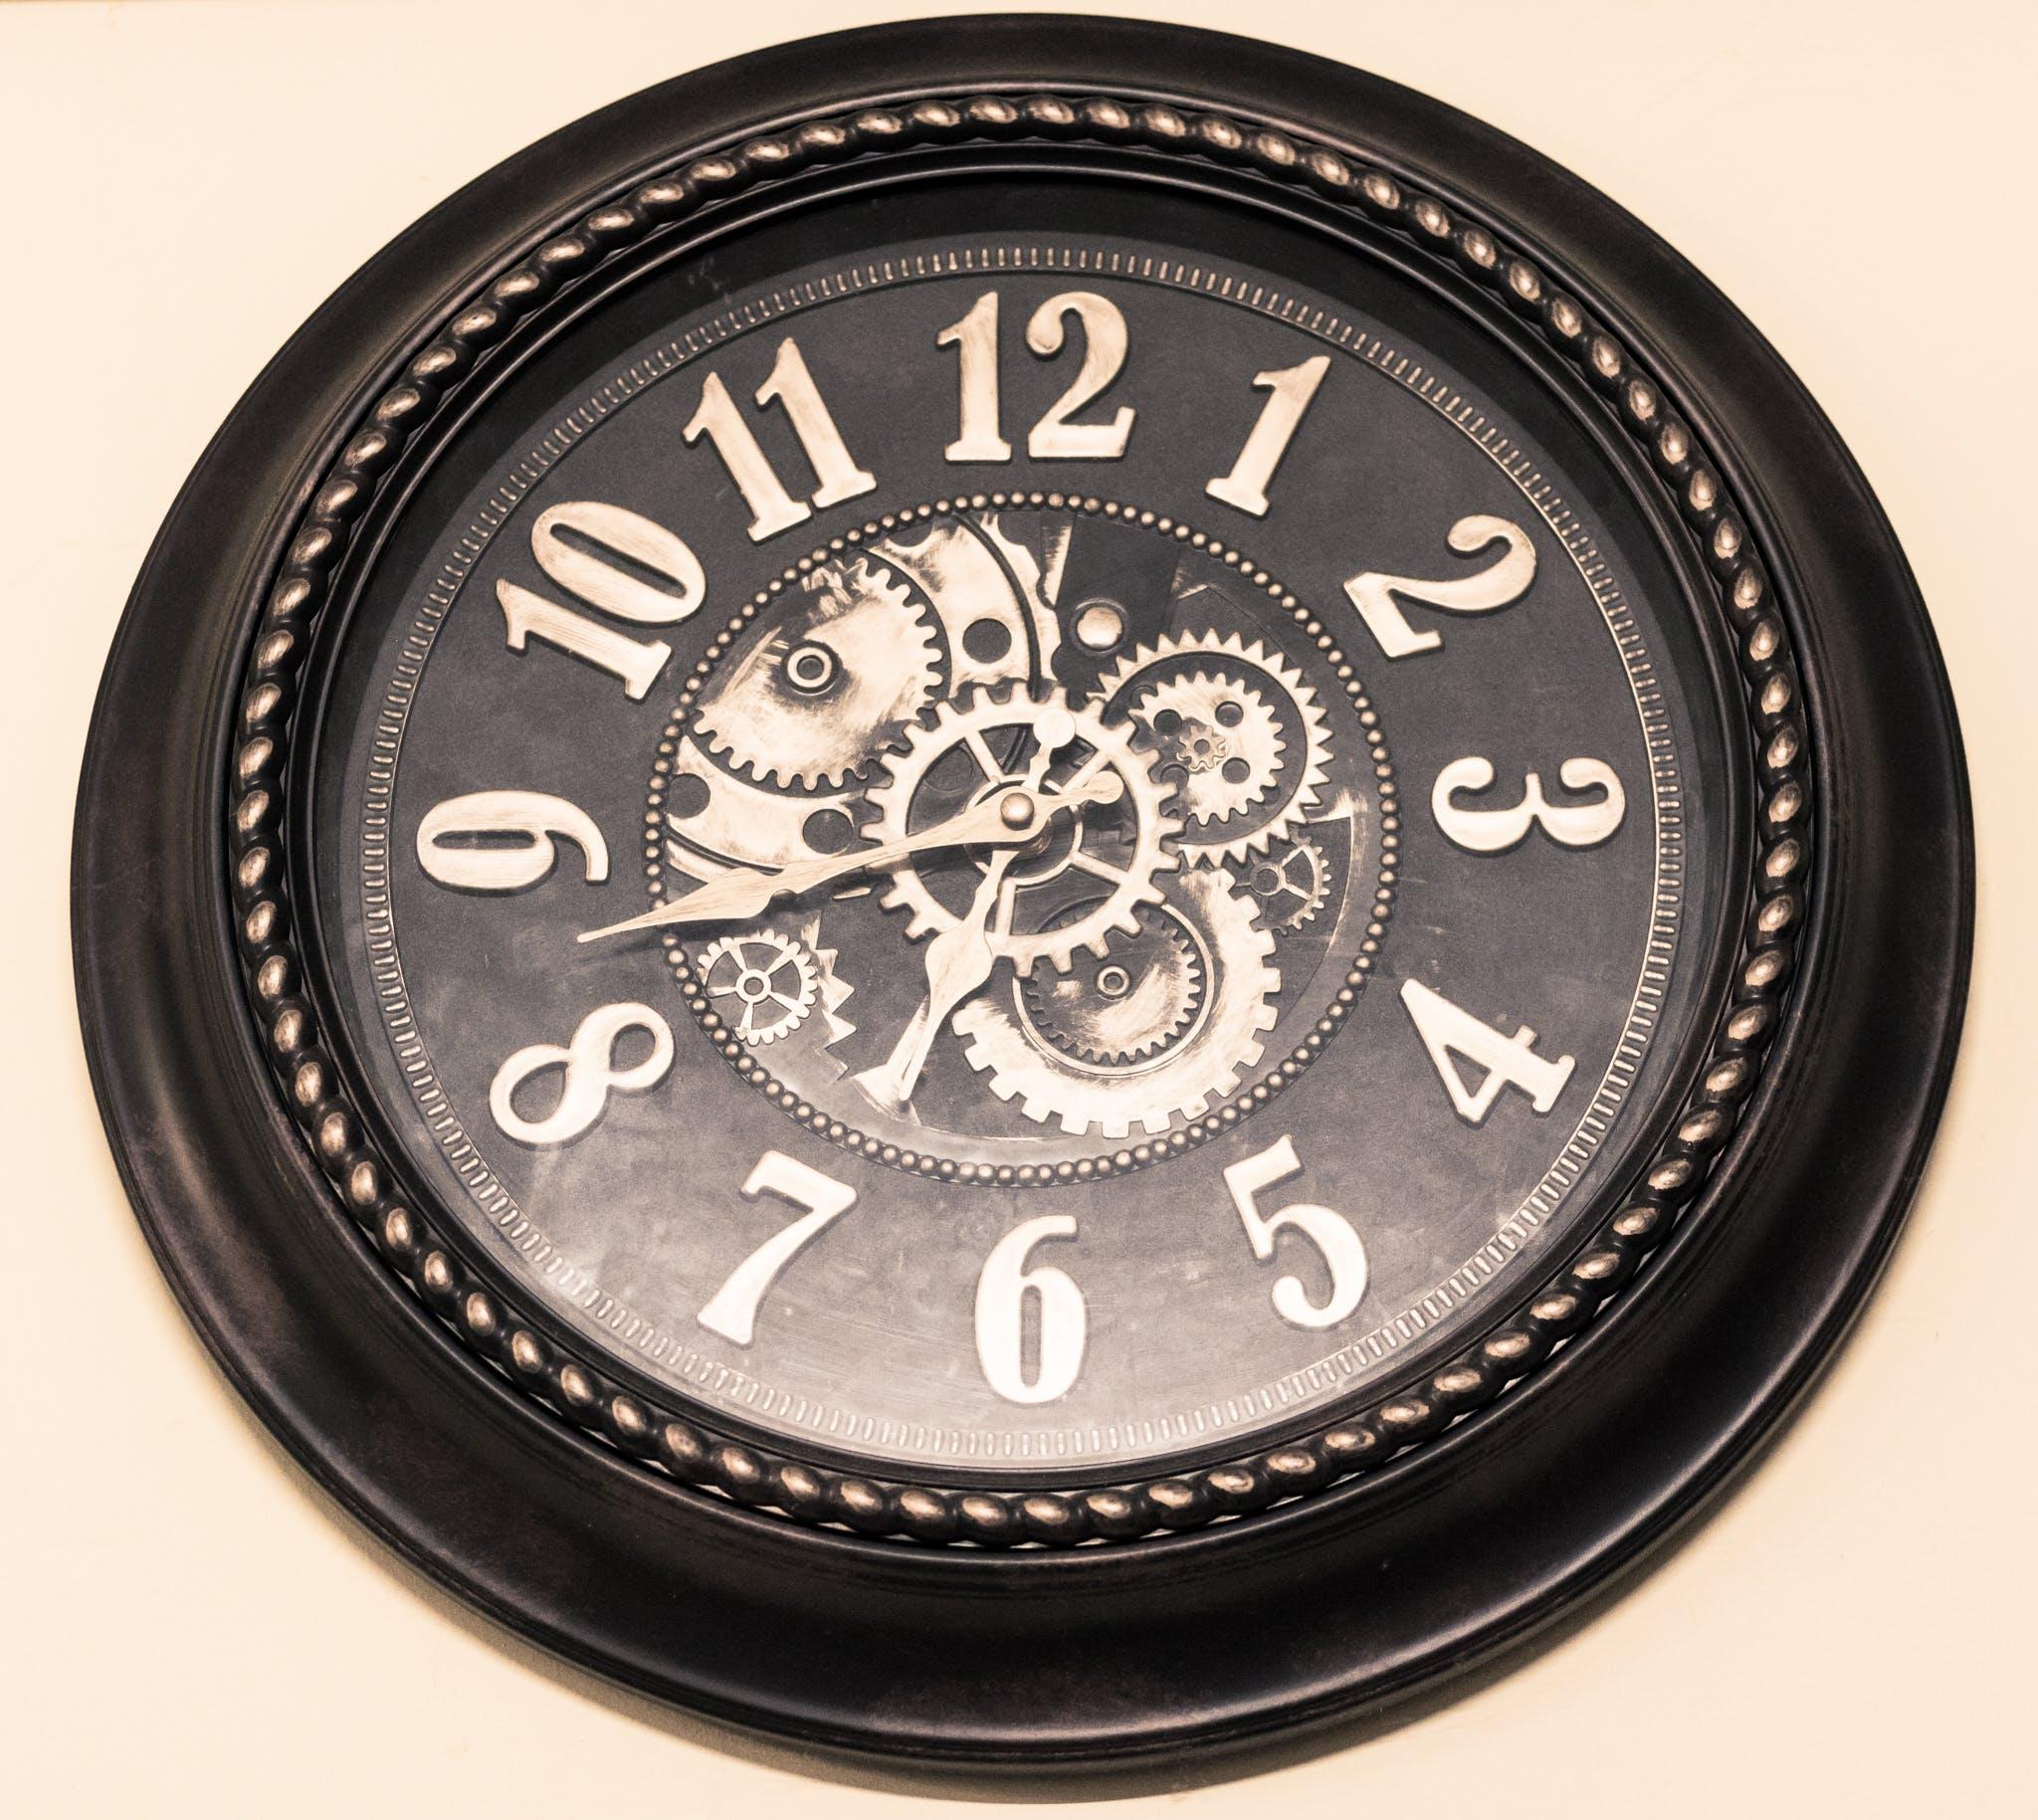 Free stock photo of alarm clock, Analog watch, arrows, break time